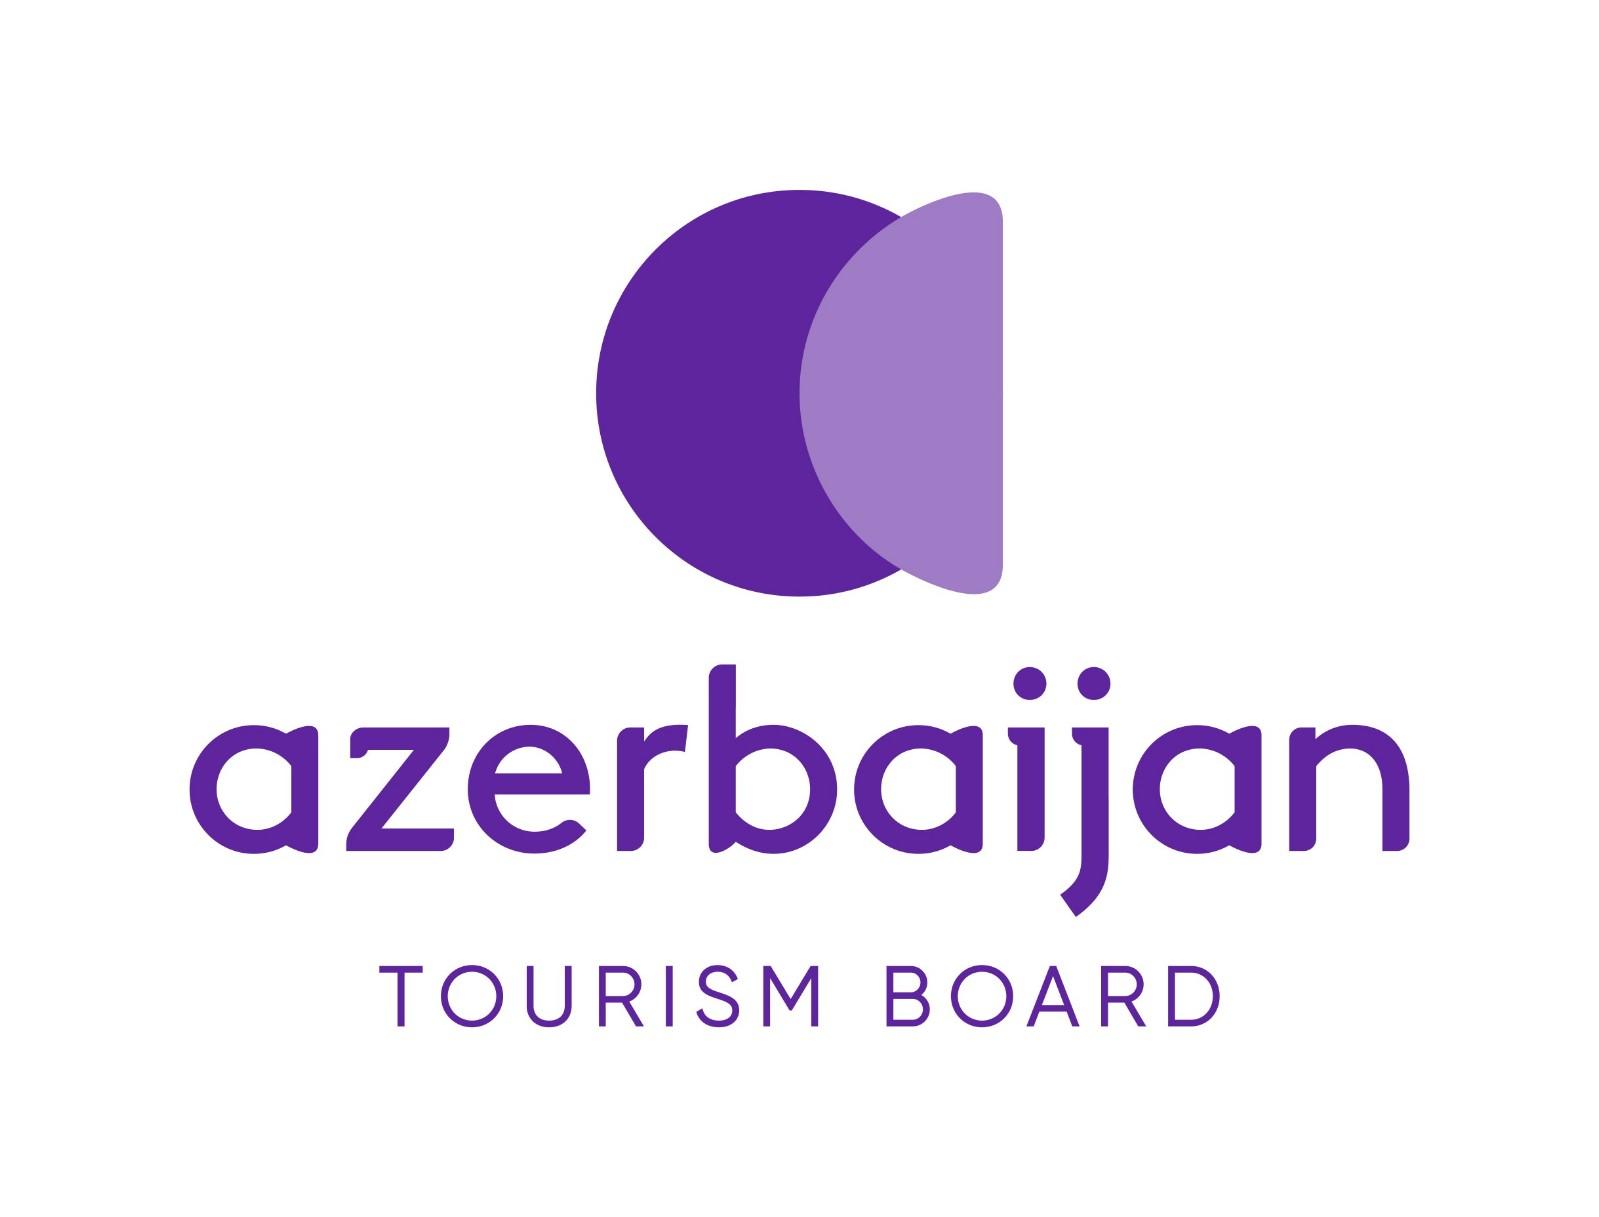 ATB - Azerbaijan Tourism Board